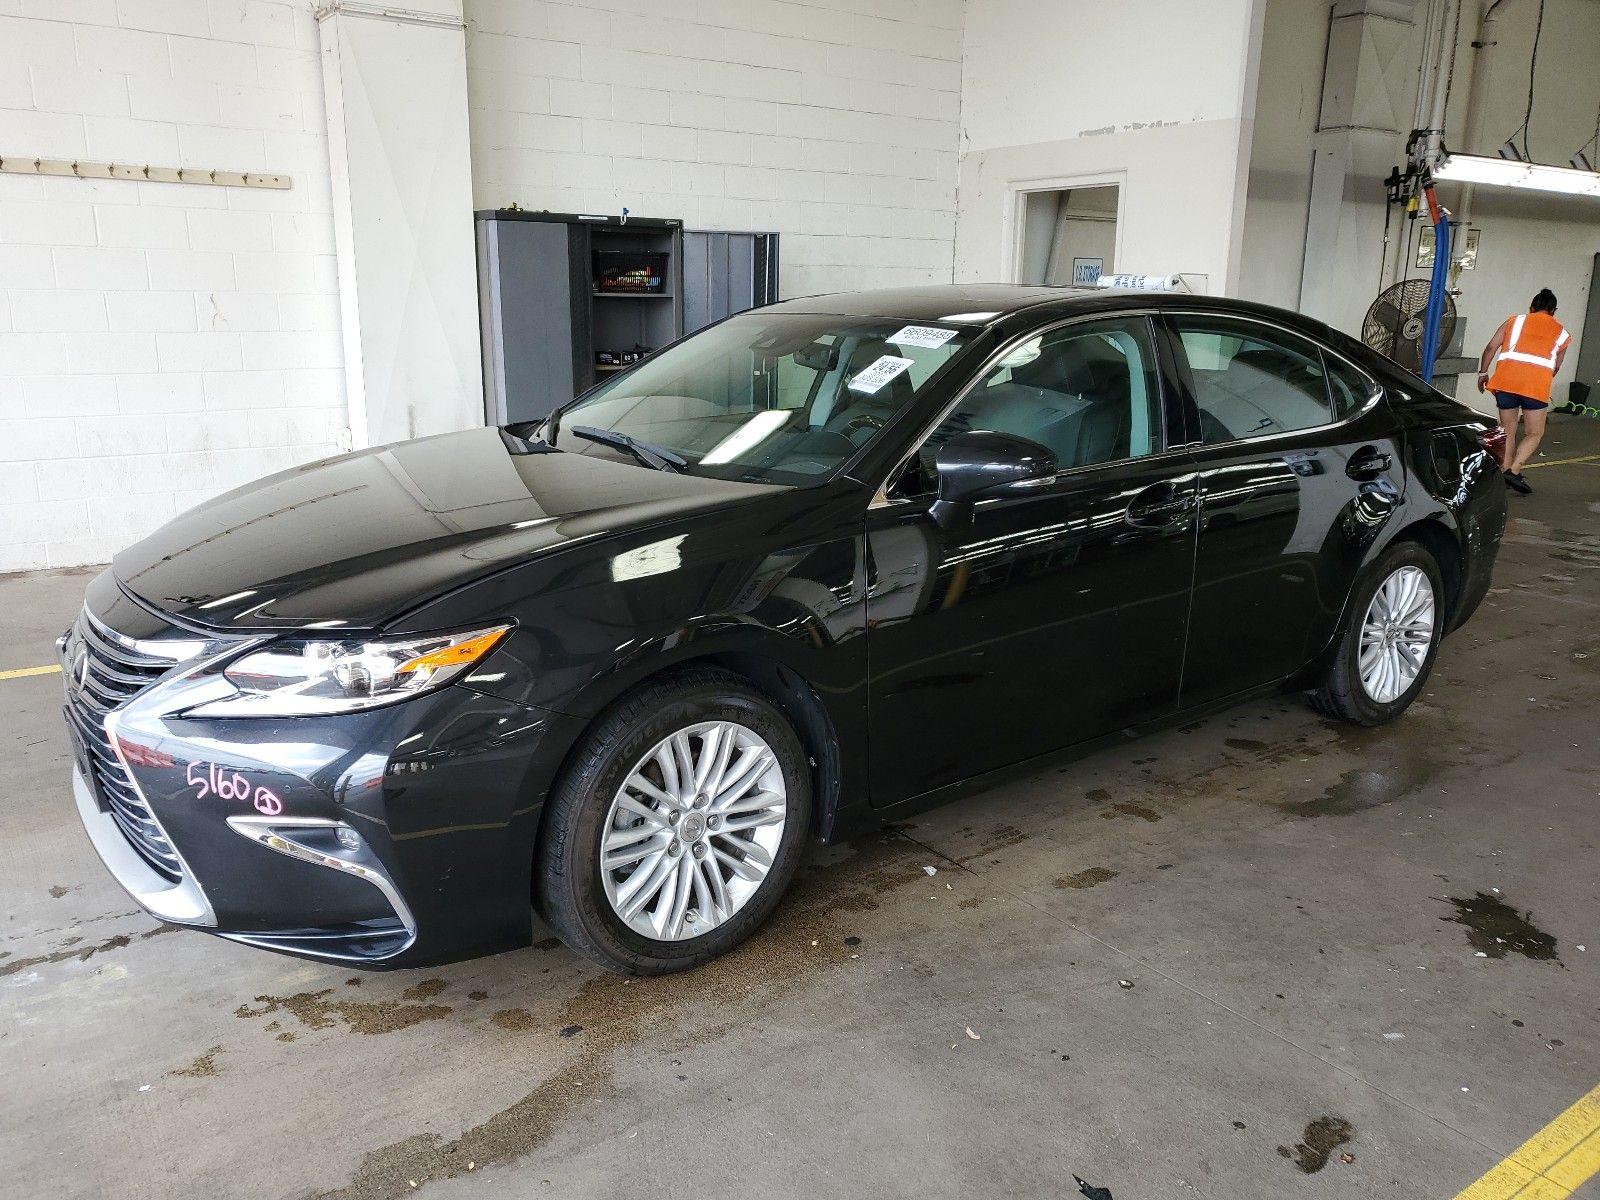 2017 Lexus ES 3.5. Lot 99921272659 Vin 58ABK1GG3HU055160